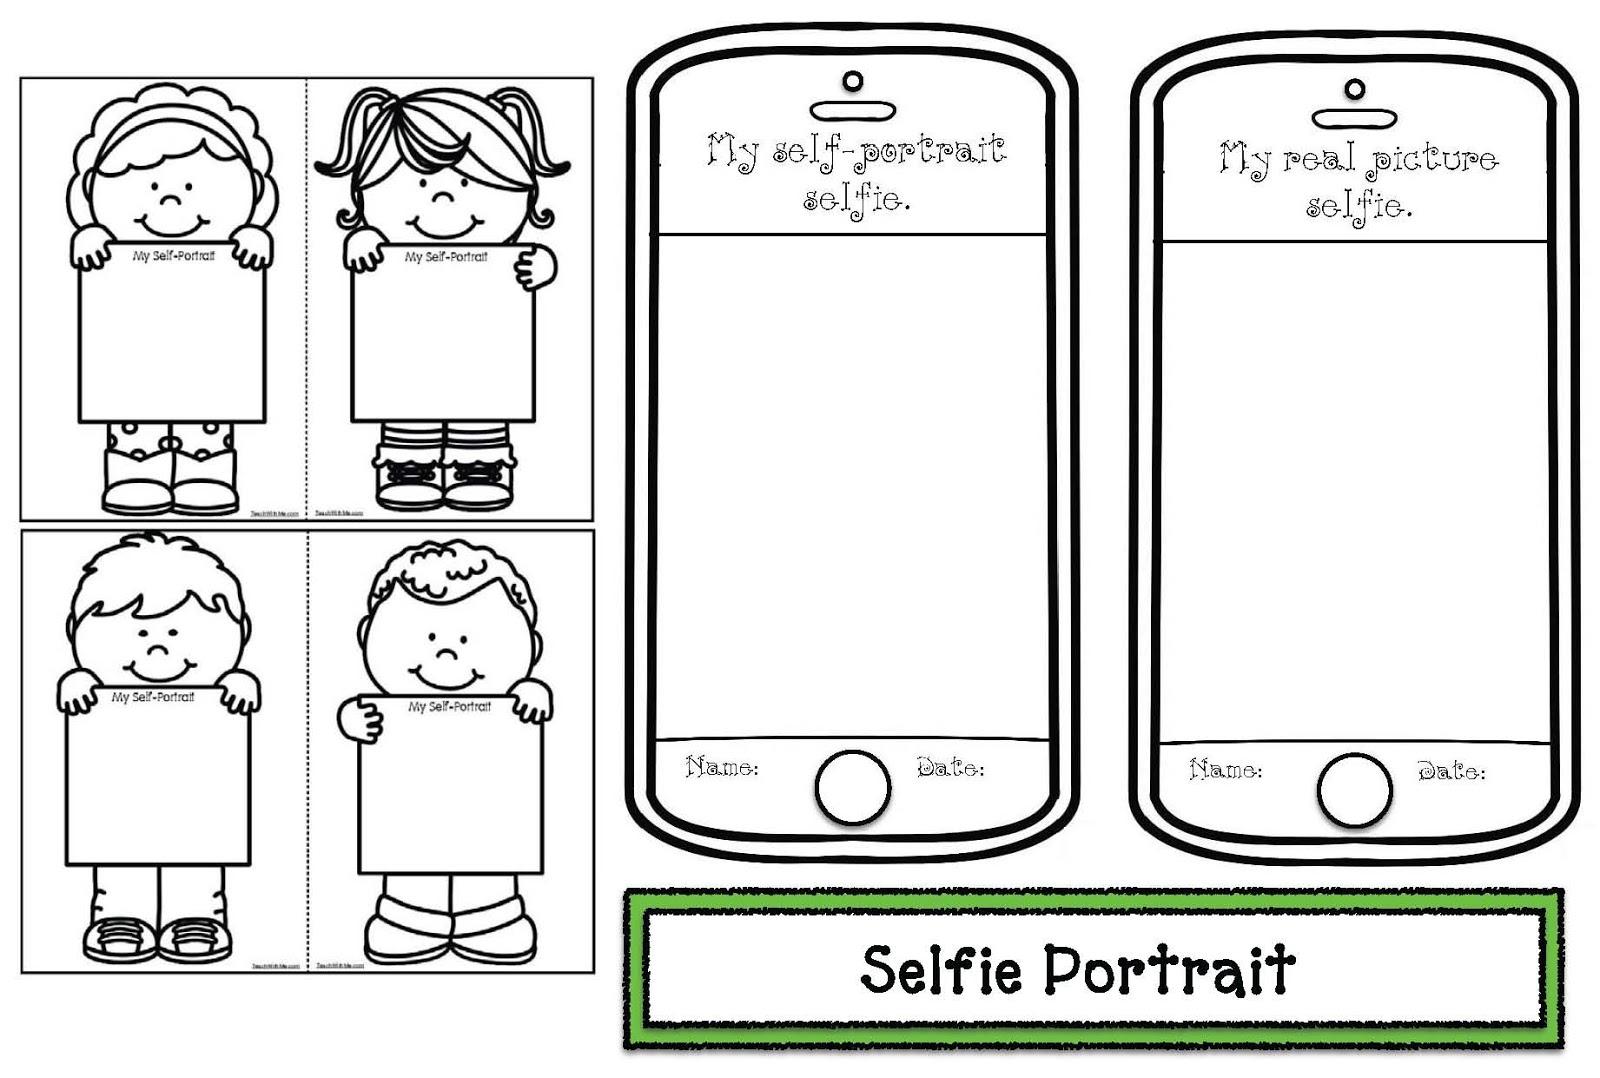 Make A Selfie Portrait